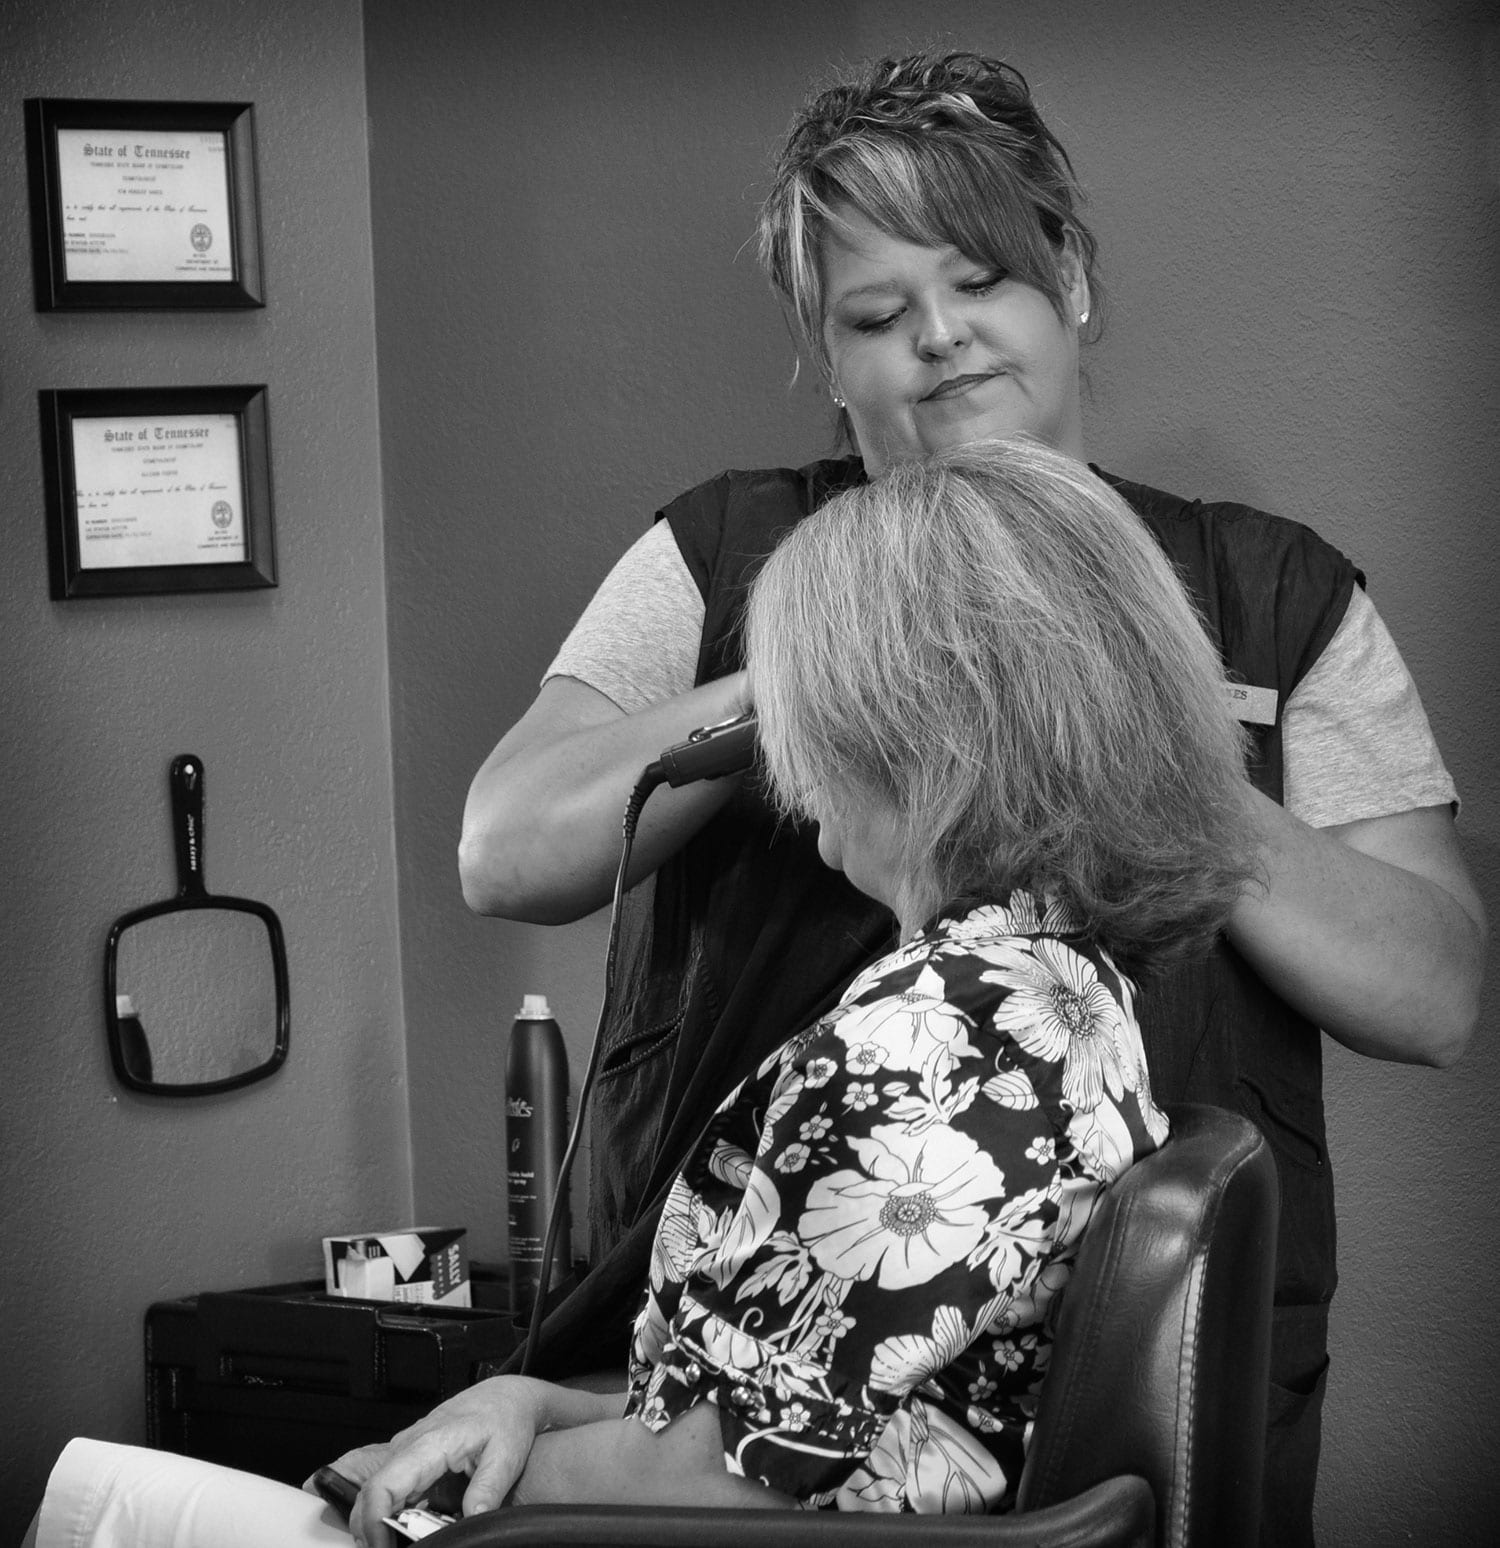 Sixth grade teacher, Kim Fairchild, relaxes at Villa Salon as Kim Oakes styles her hair. photo by Anne Huffman - 2010